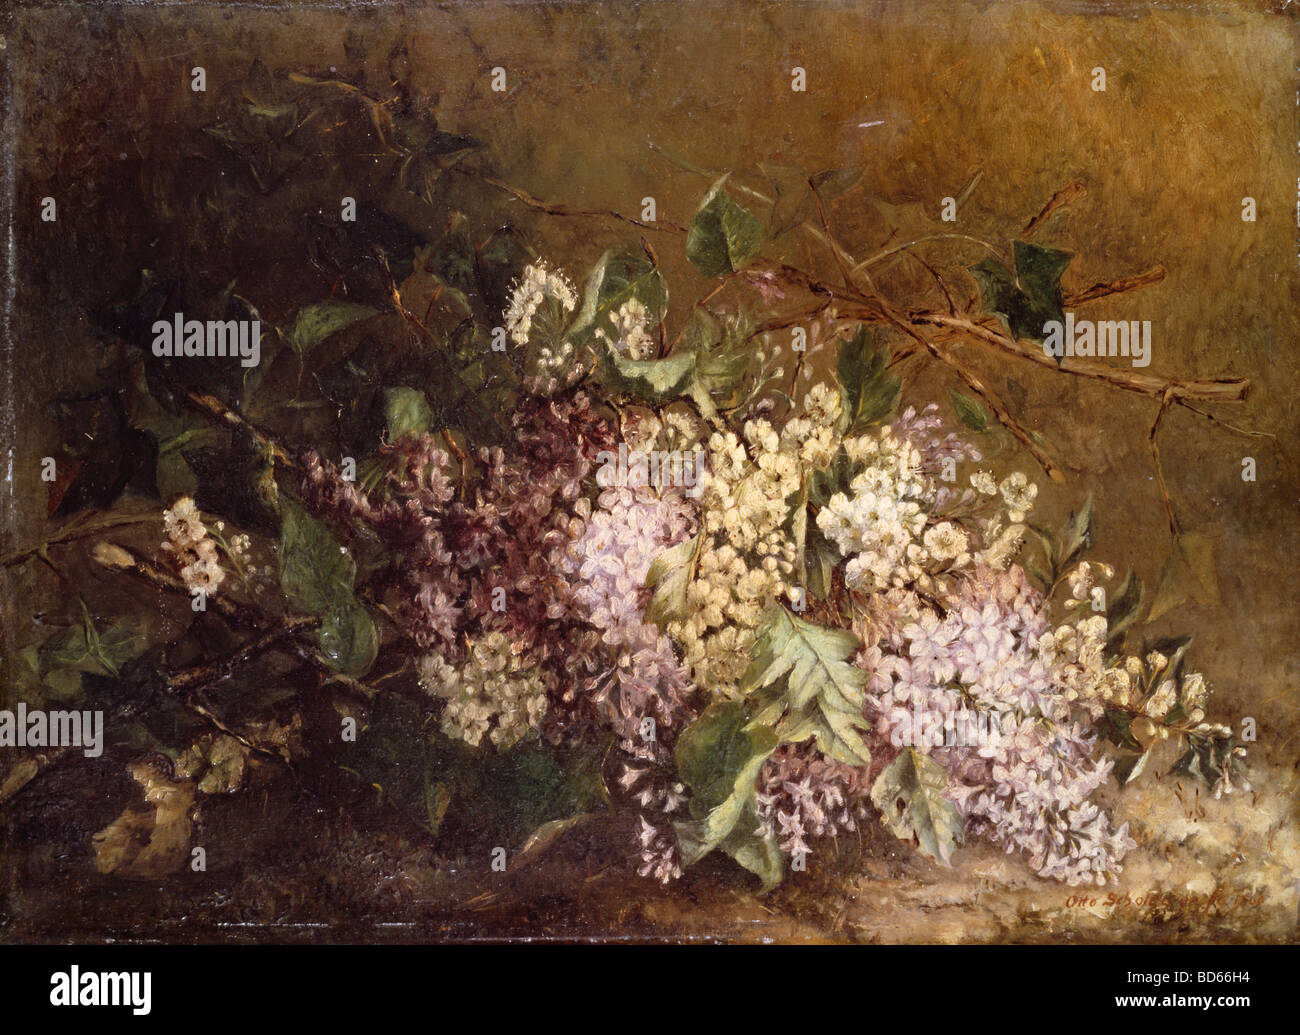 Beaux-arts, Henri Evenepoel, Otto (1834 - 1902), peinture, 'tillife avec Lilac' ('Fliederstilleben'), Photo Stock